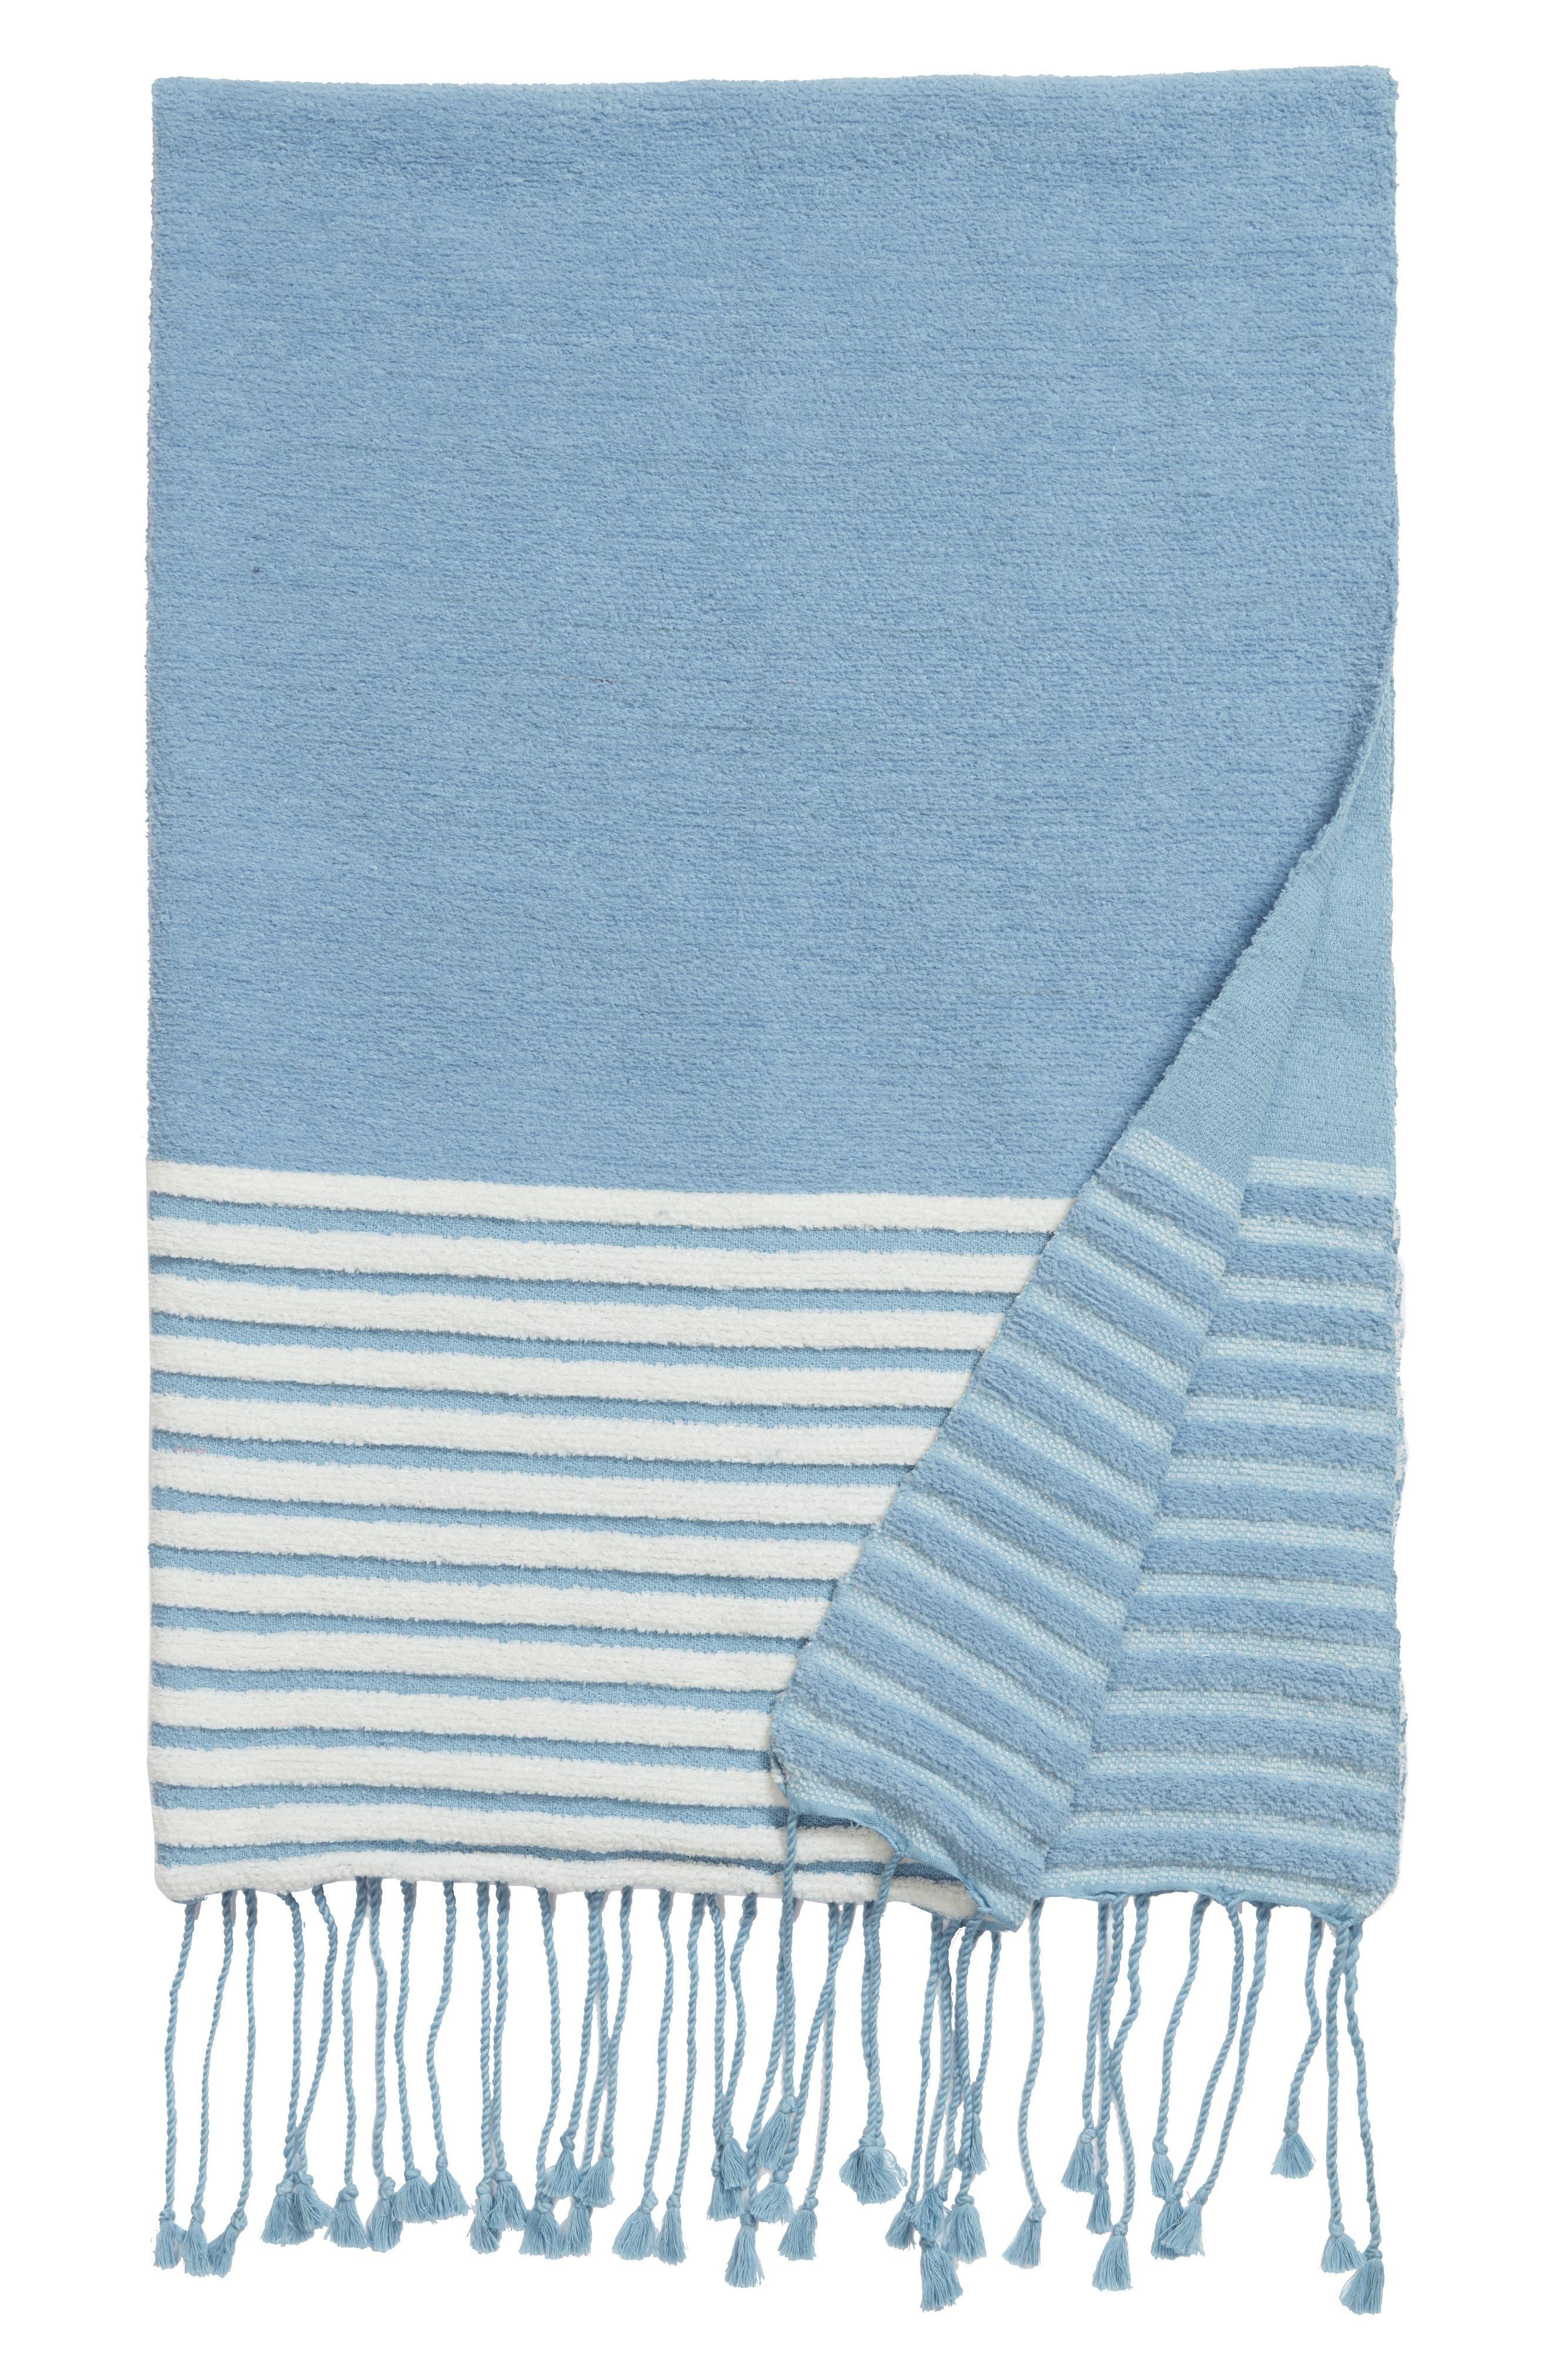 Hammam Stripe Throw,                         Main,                         color, Blue Drizzle